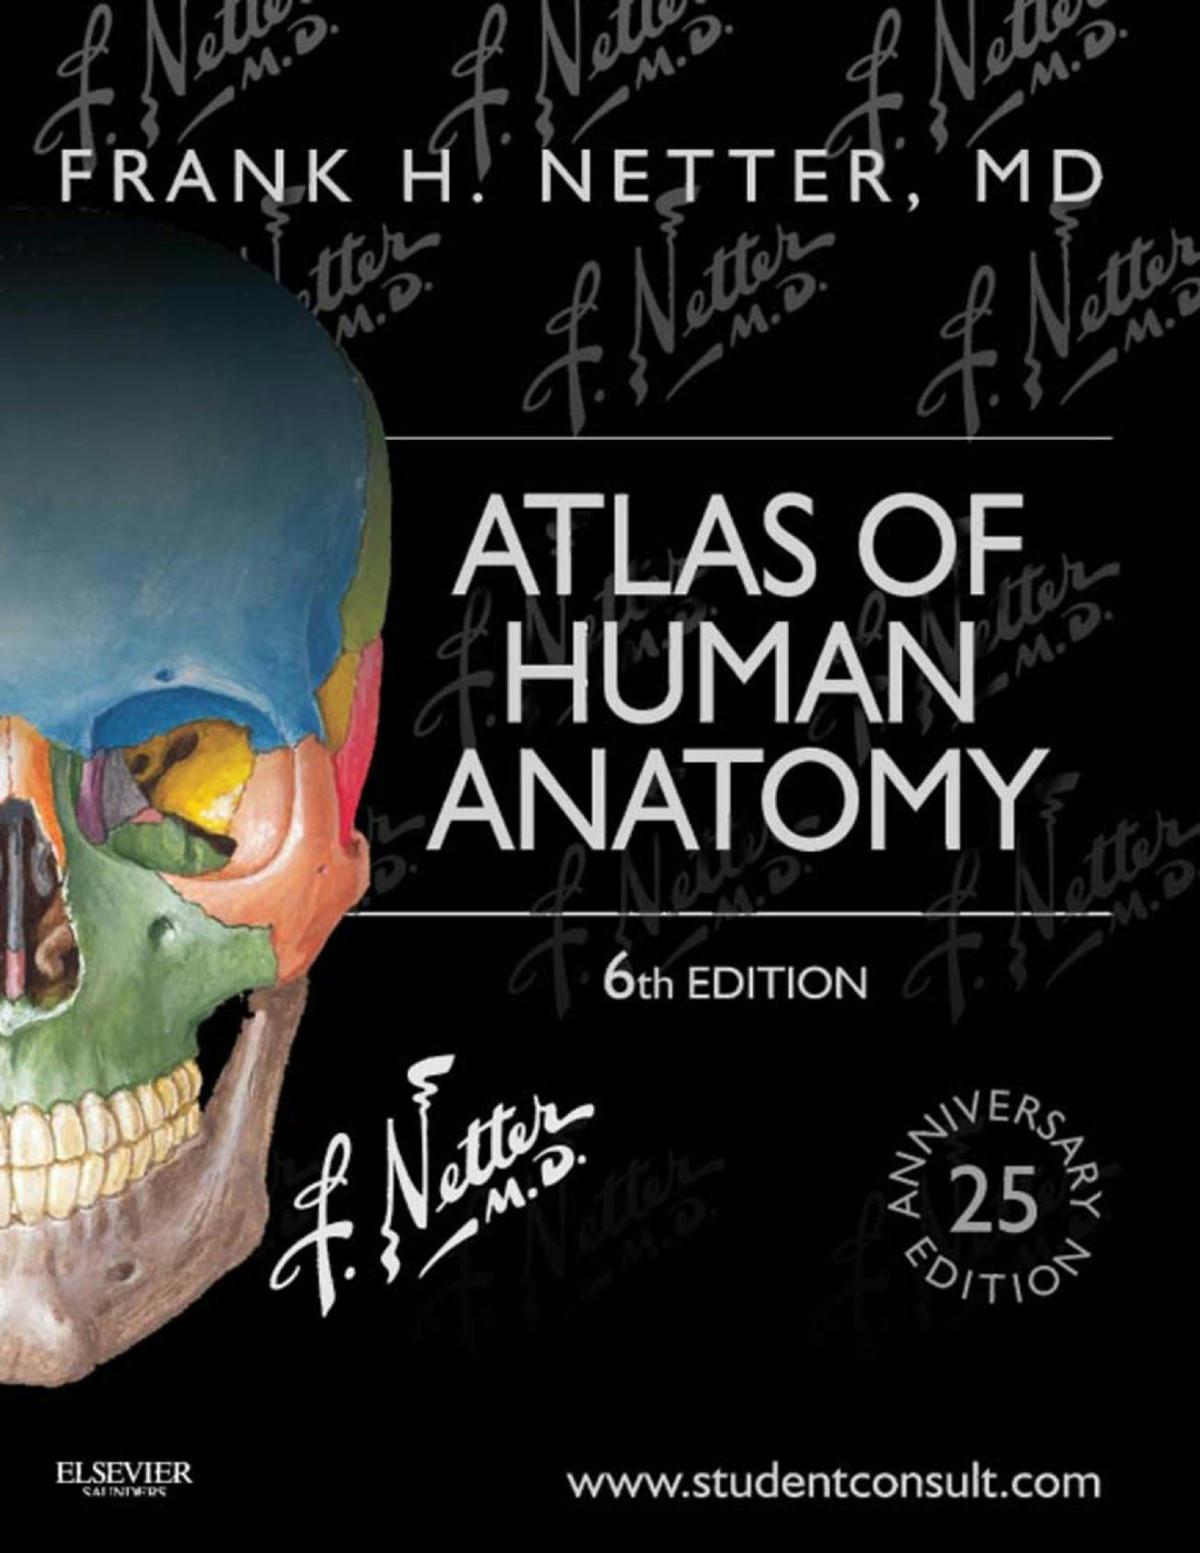 [LIVRE] Atlas of Human Anatomy, Frank Netter  Granu3jw1vnmv95zg